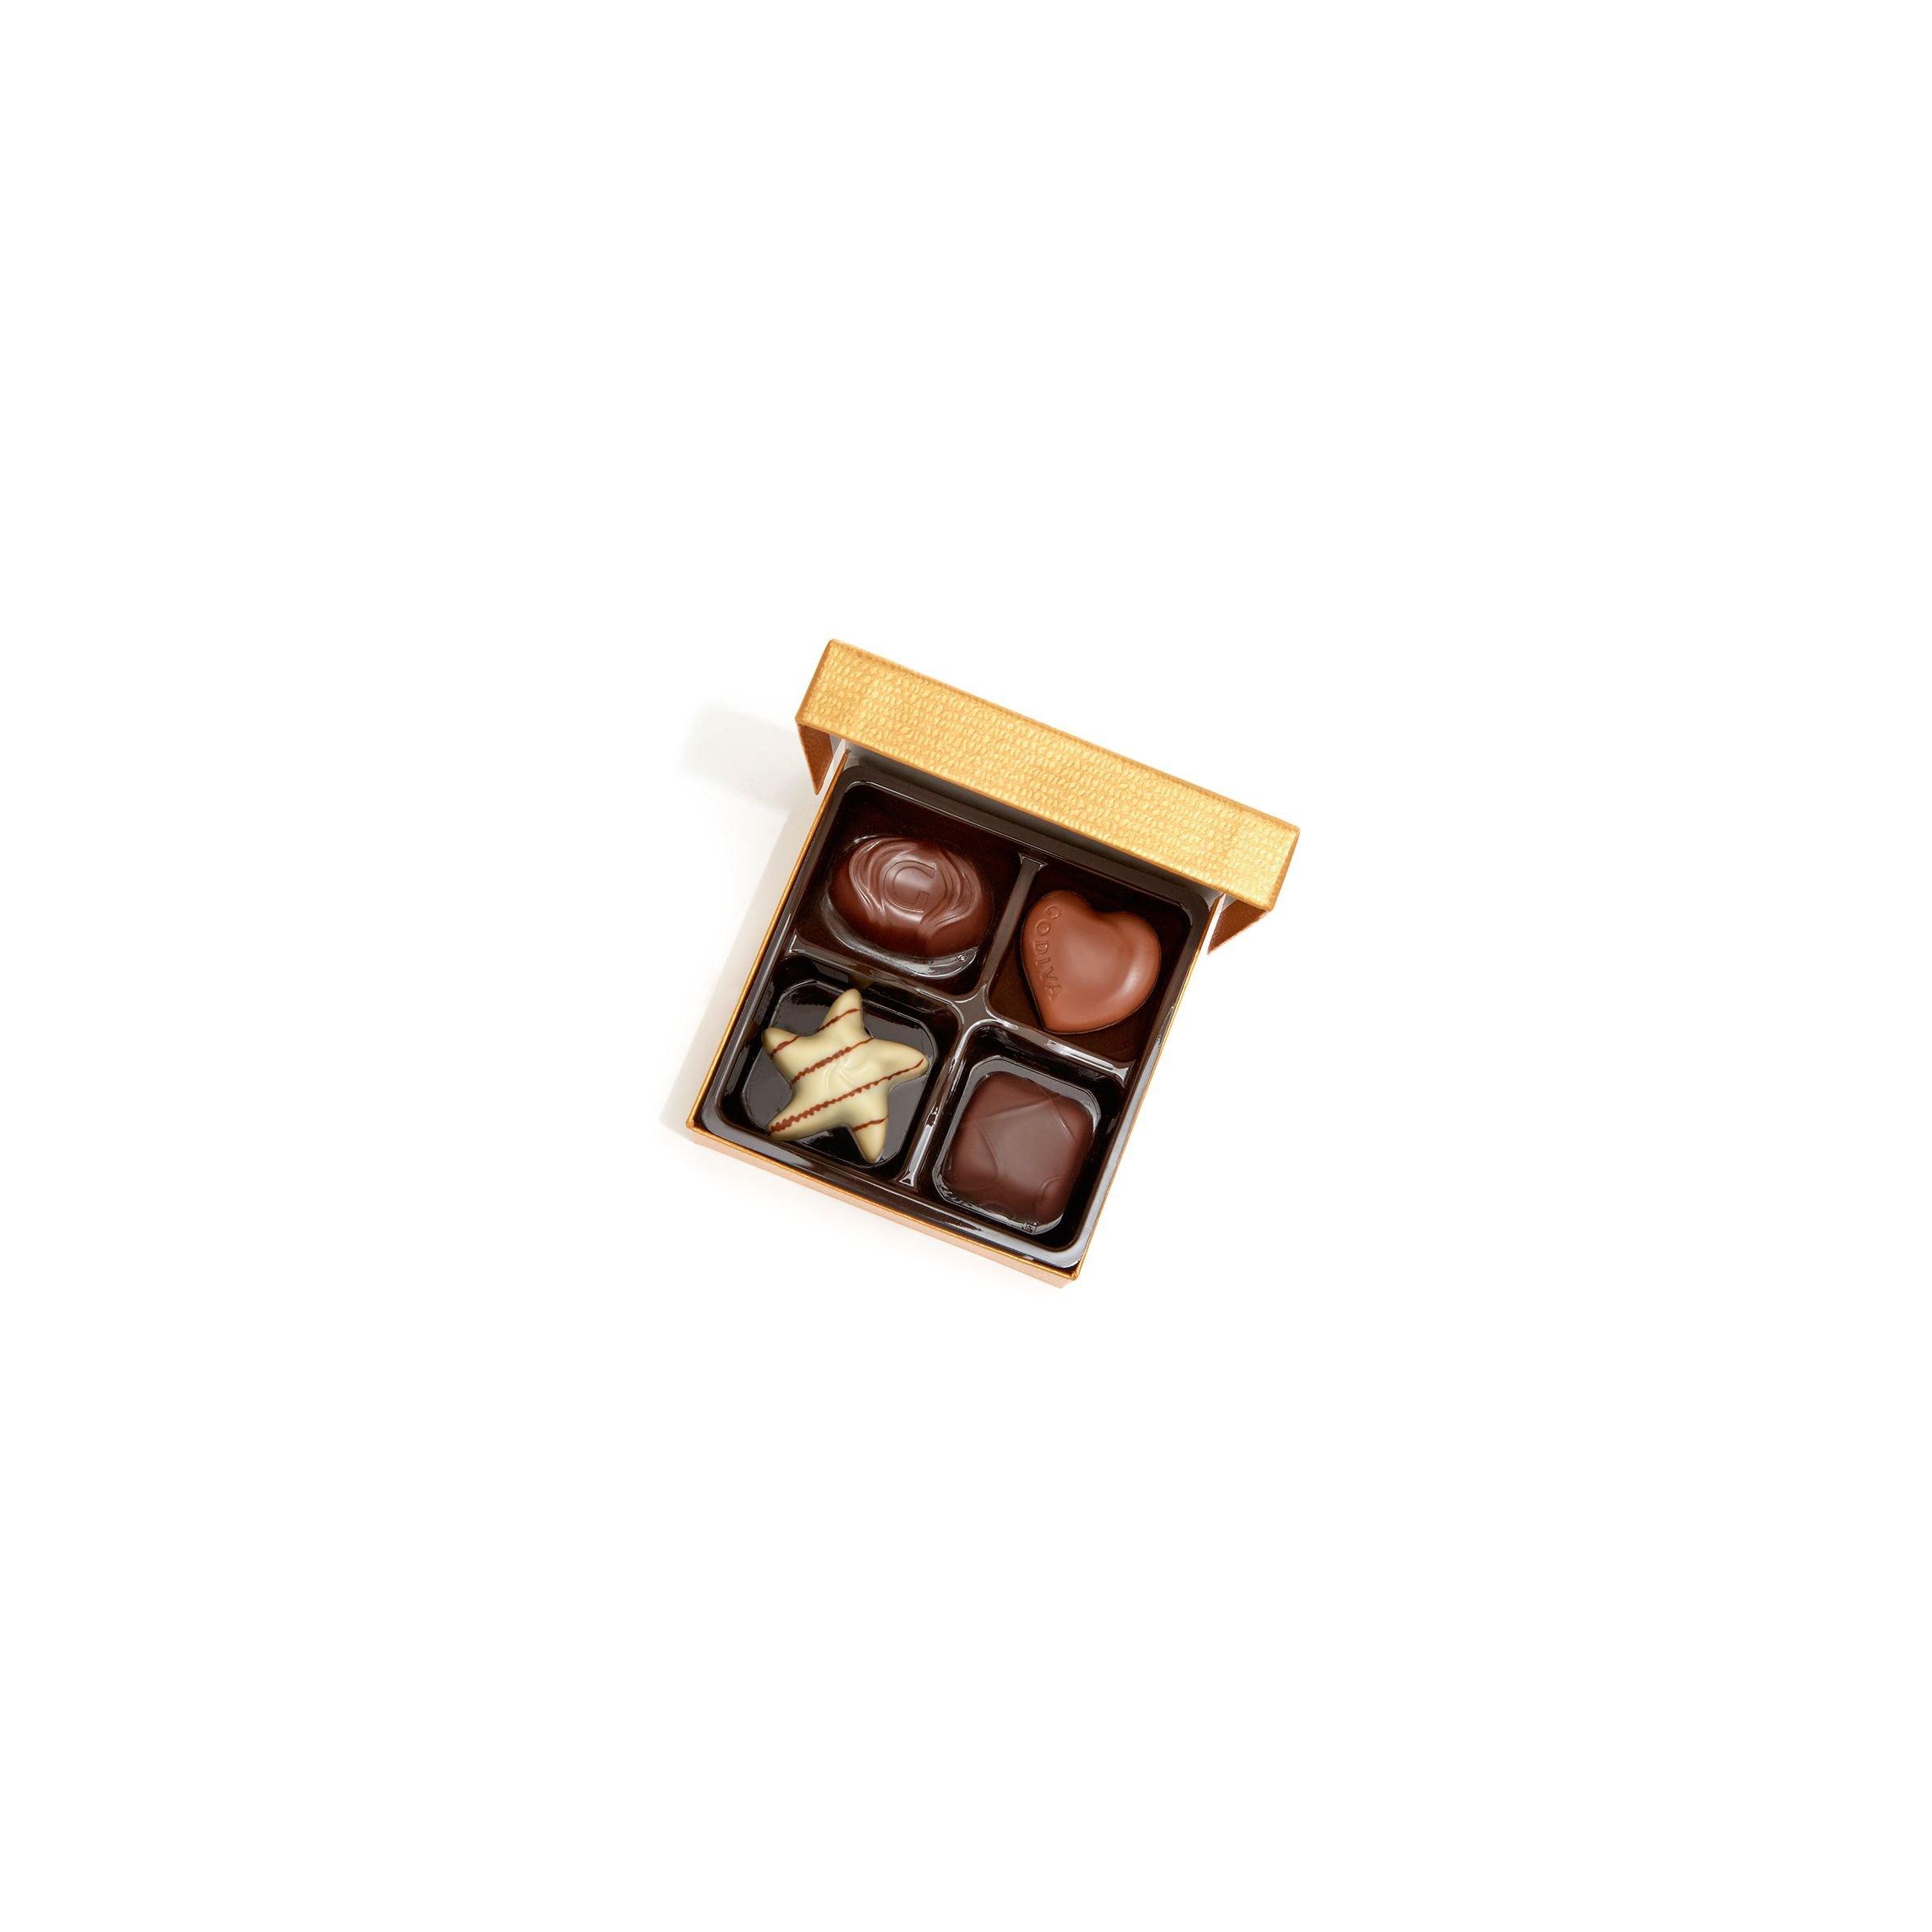 Godiva Chocolatier Assorted Chocolate Gold Favor Box, White Ribbon, Chocolate Wedding Favors, Birthday Favors, Set of 12 by GODIVA Chocolatier (Image #3)